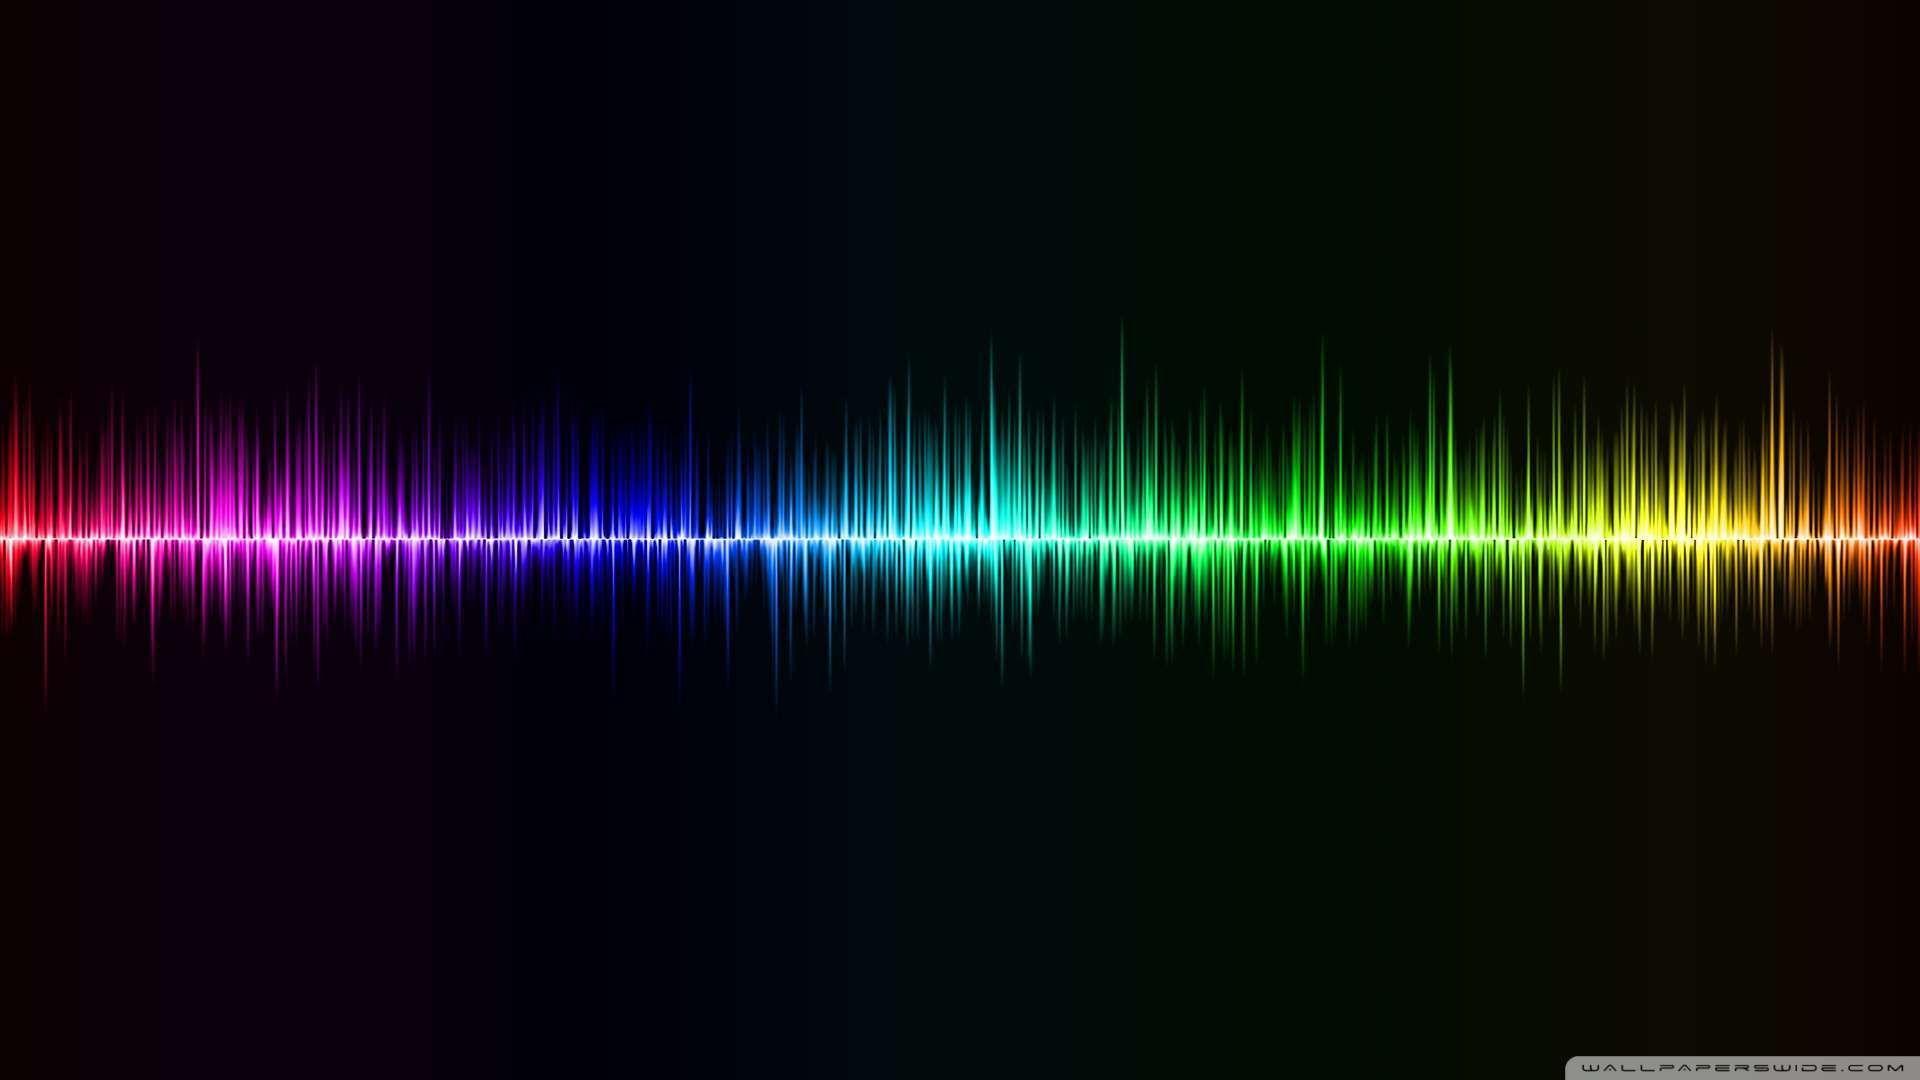 Music Sound Waves Live Wallpaper Wallpapersafari Desktop Wallpapers Backgrounds Cool Backgrounds Wallpapers 2048x1152 Wallpapers